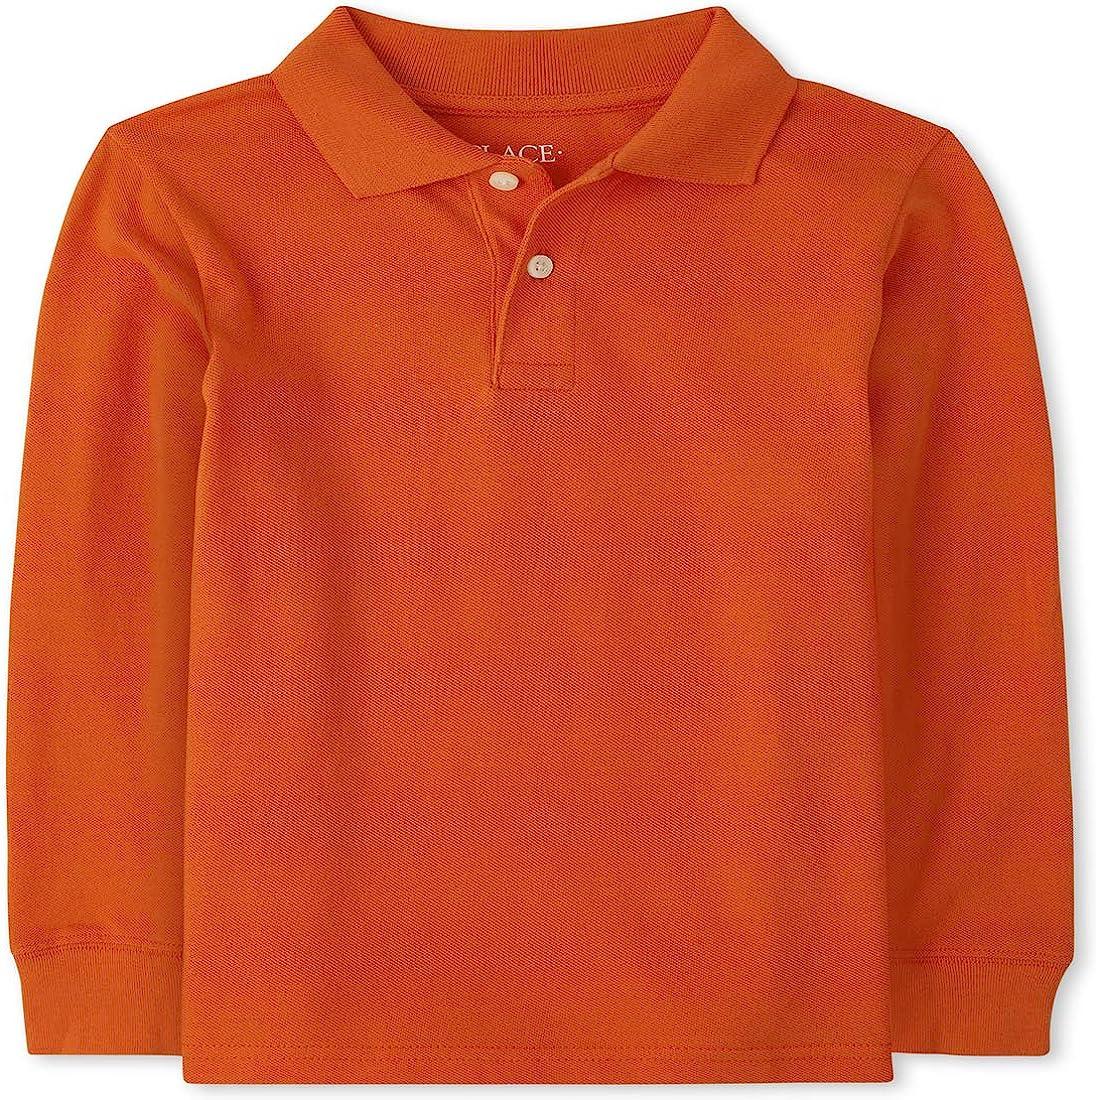 The Children's Place Boys' Uniform Long Sleeve Pique Polo